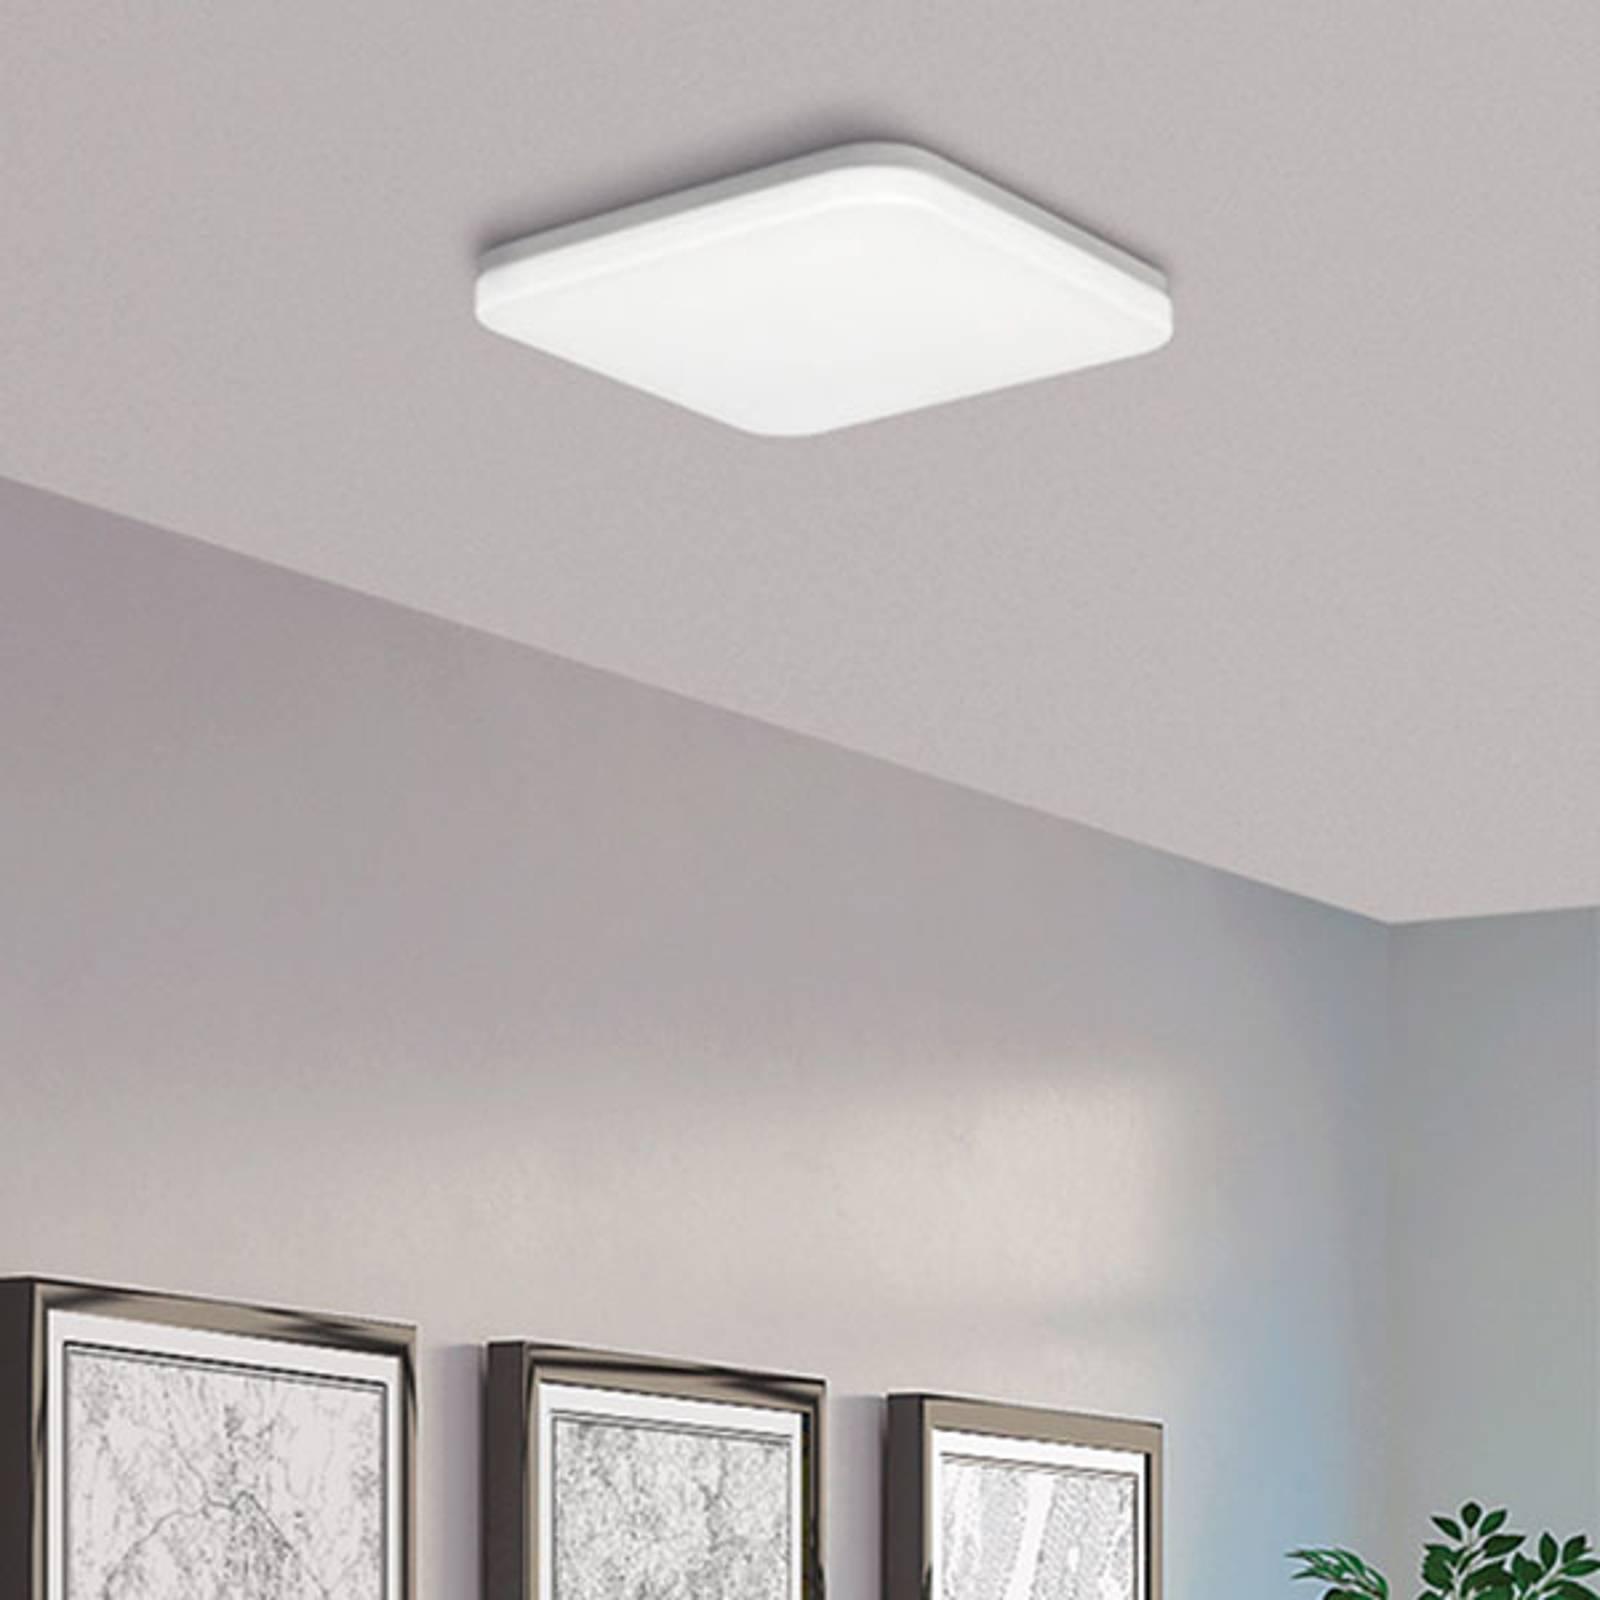 LED plafondlamp Uzza, Triac, 3.000K, met Casambi